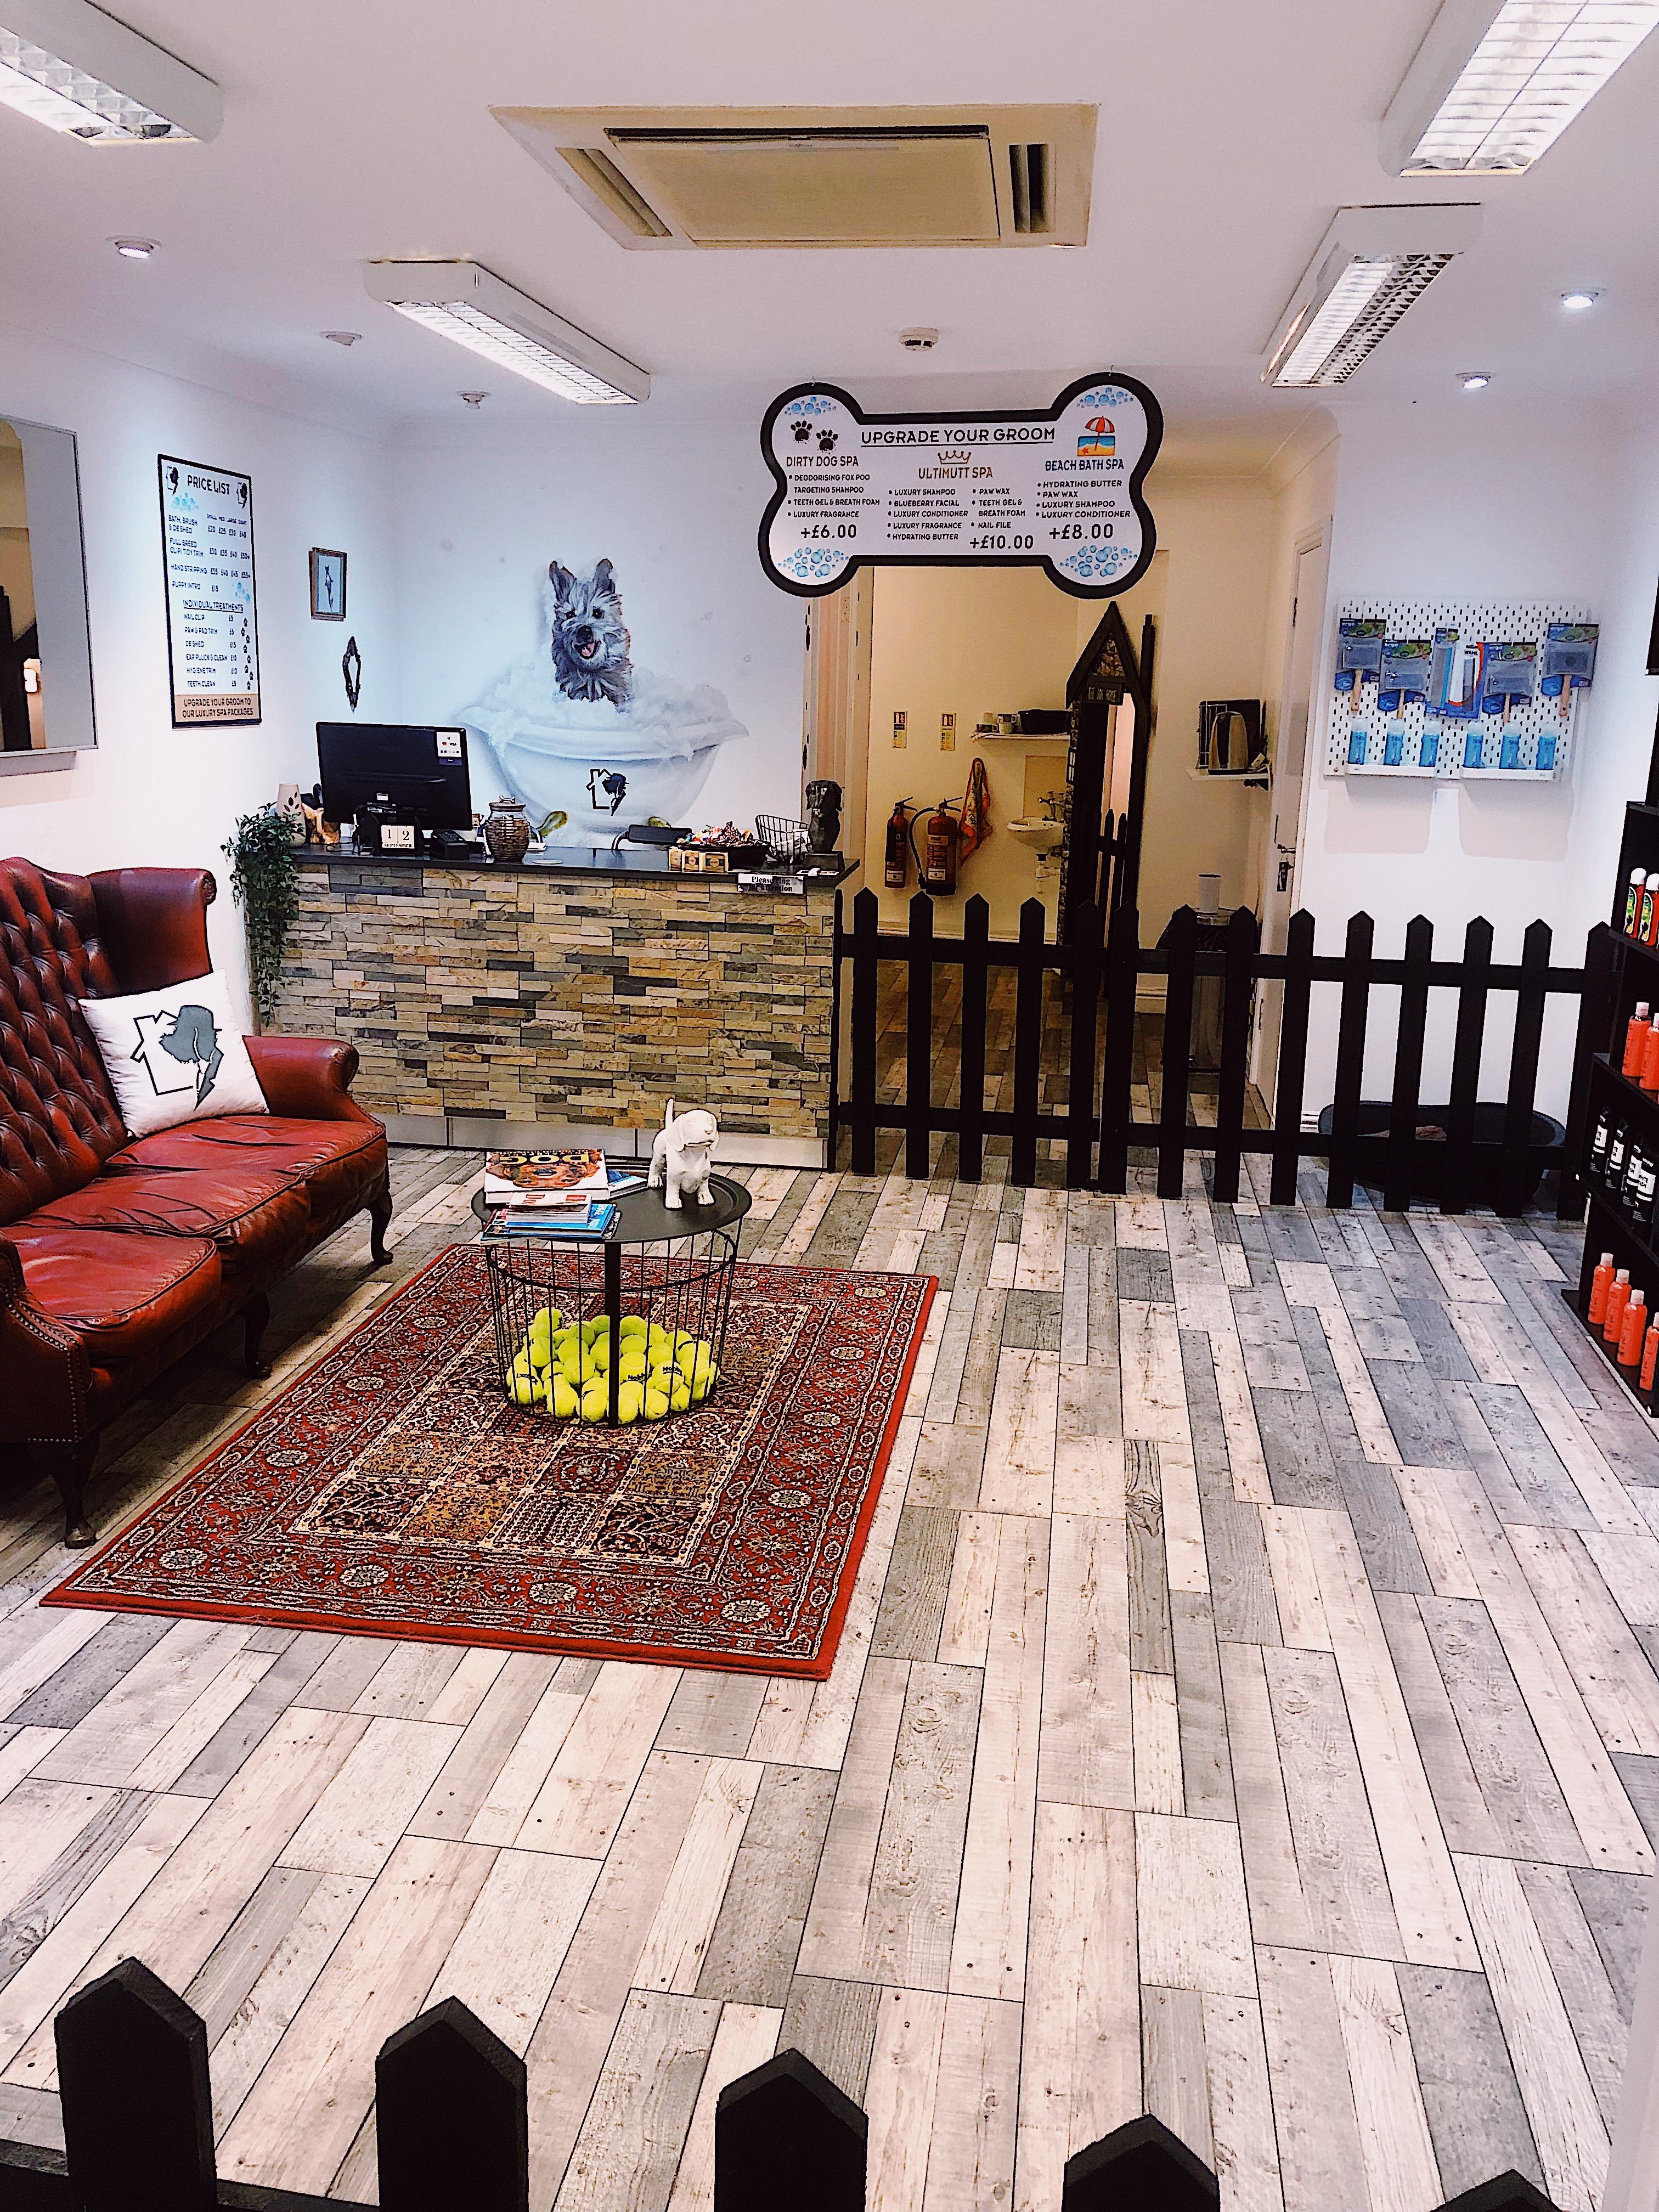 Inside The Dog Grooming Salon